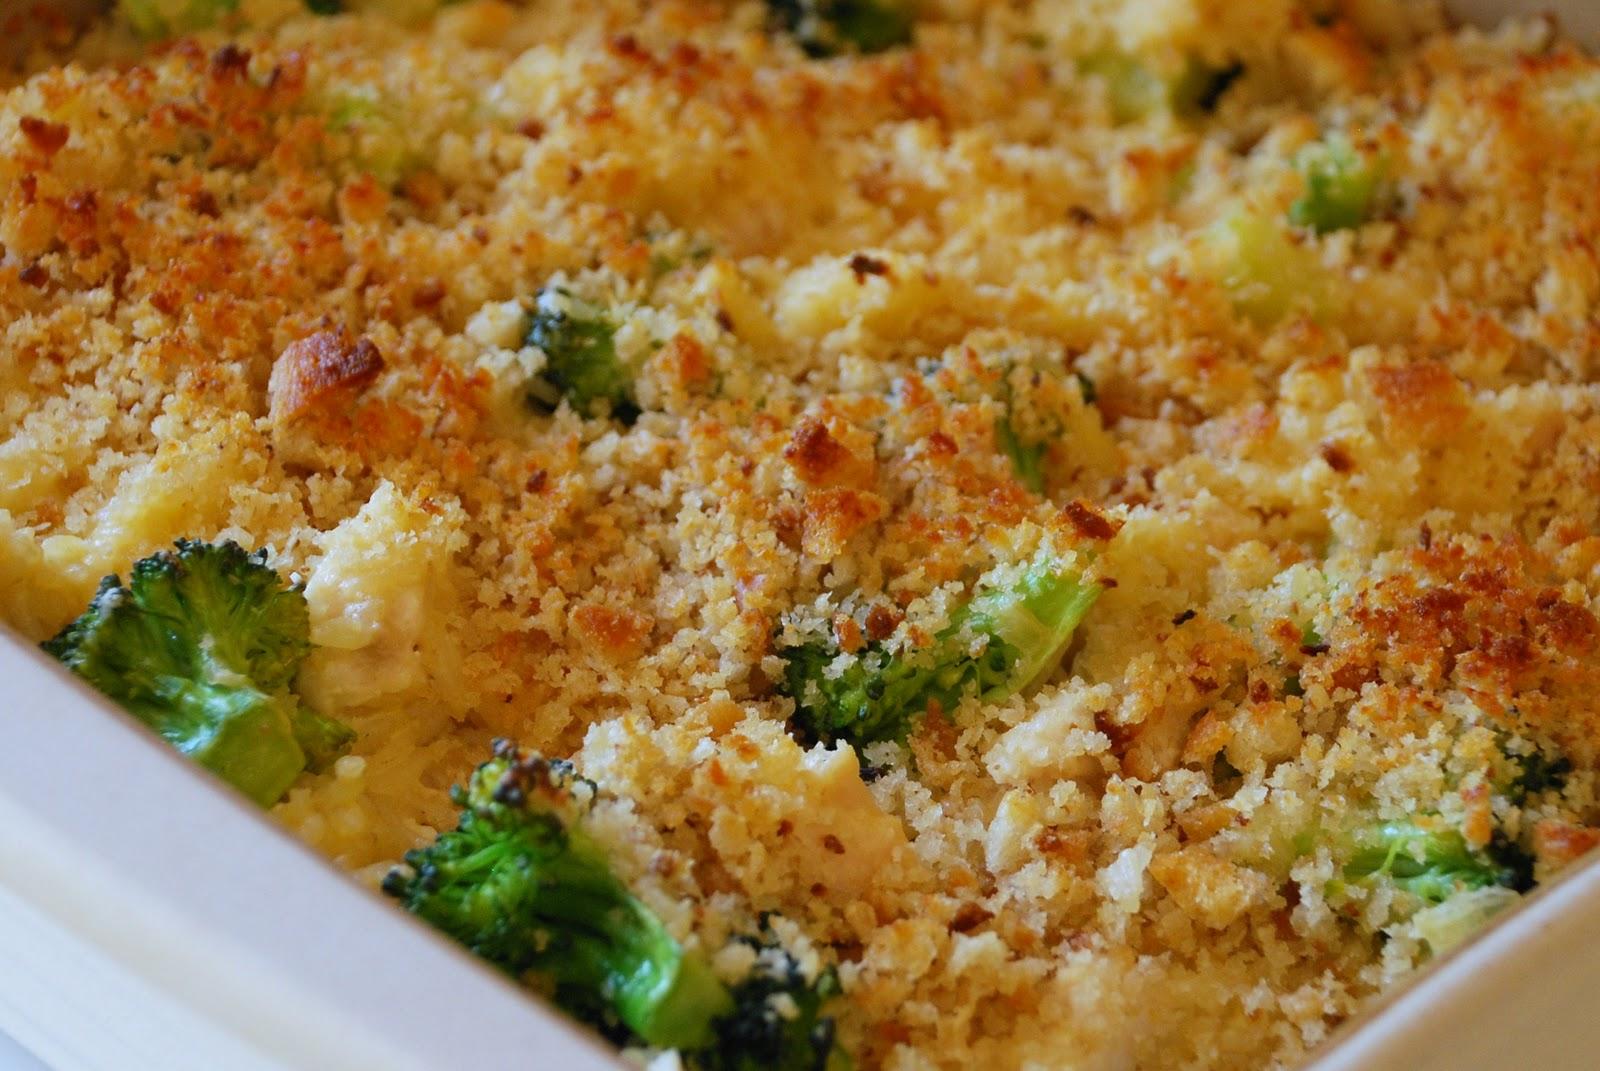 Everyday Insanity...: Cheesy Broccoli and Rice Casserole